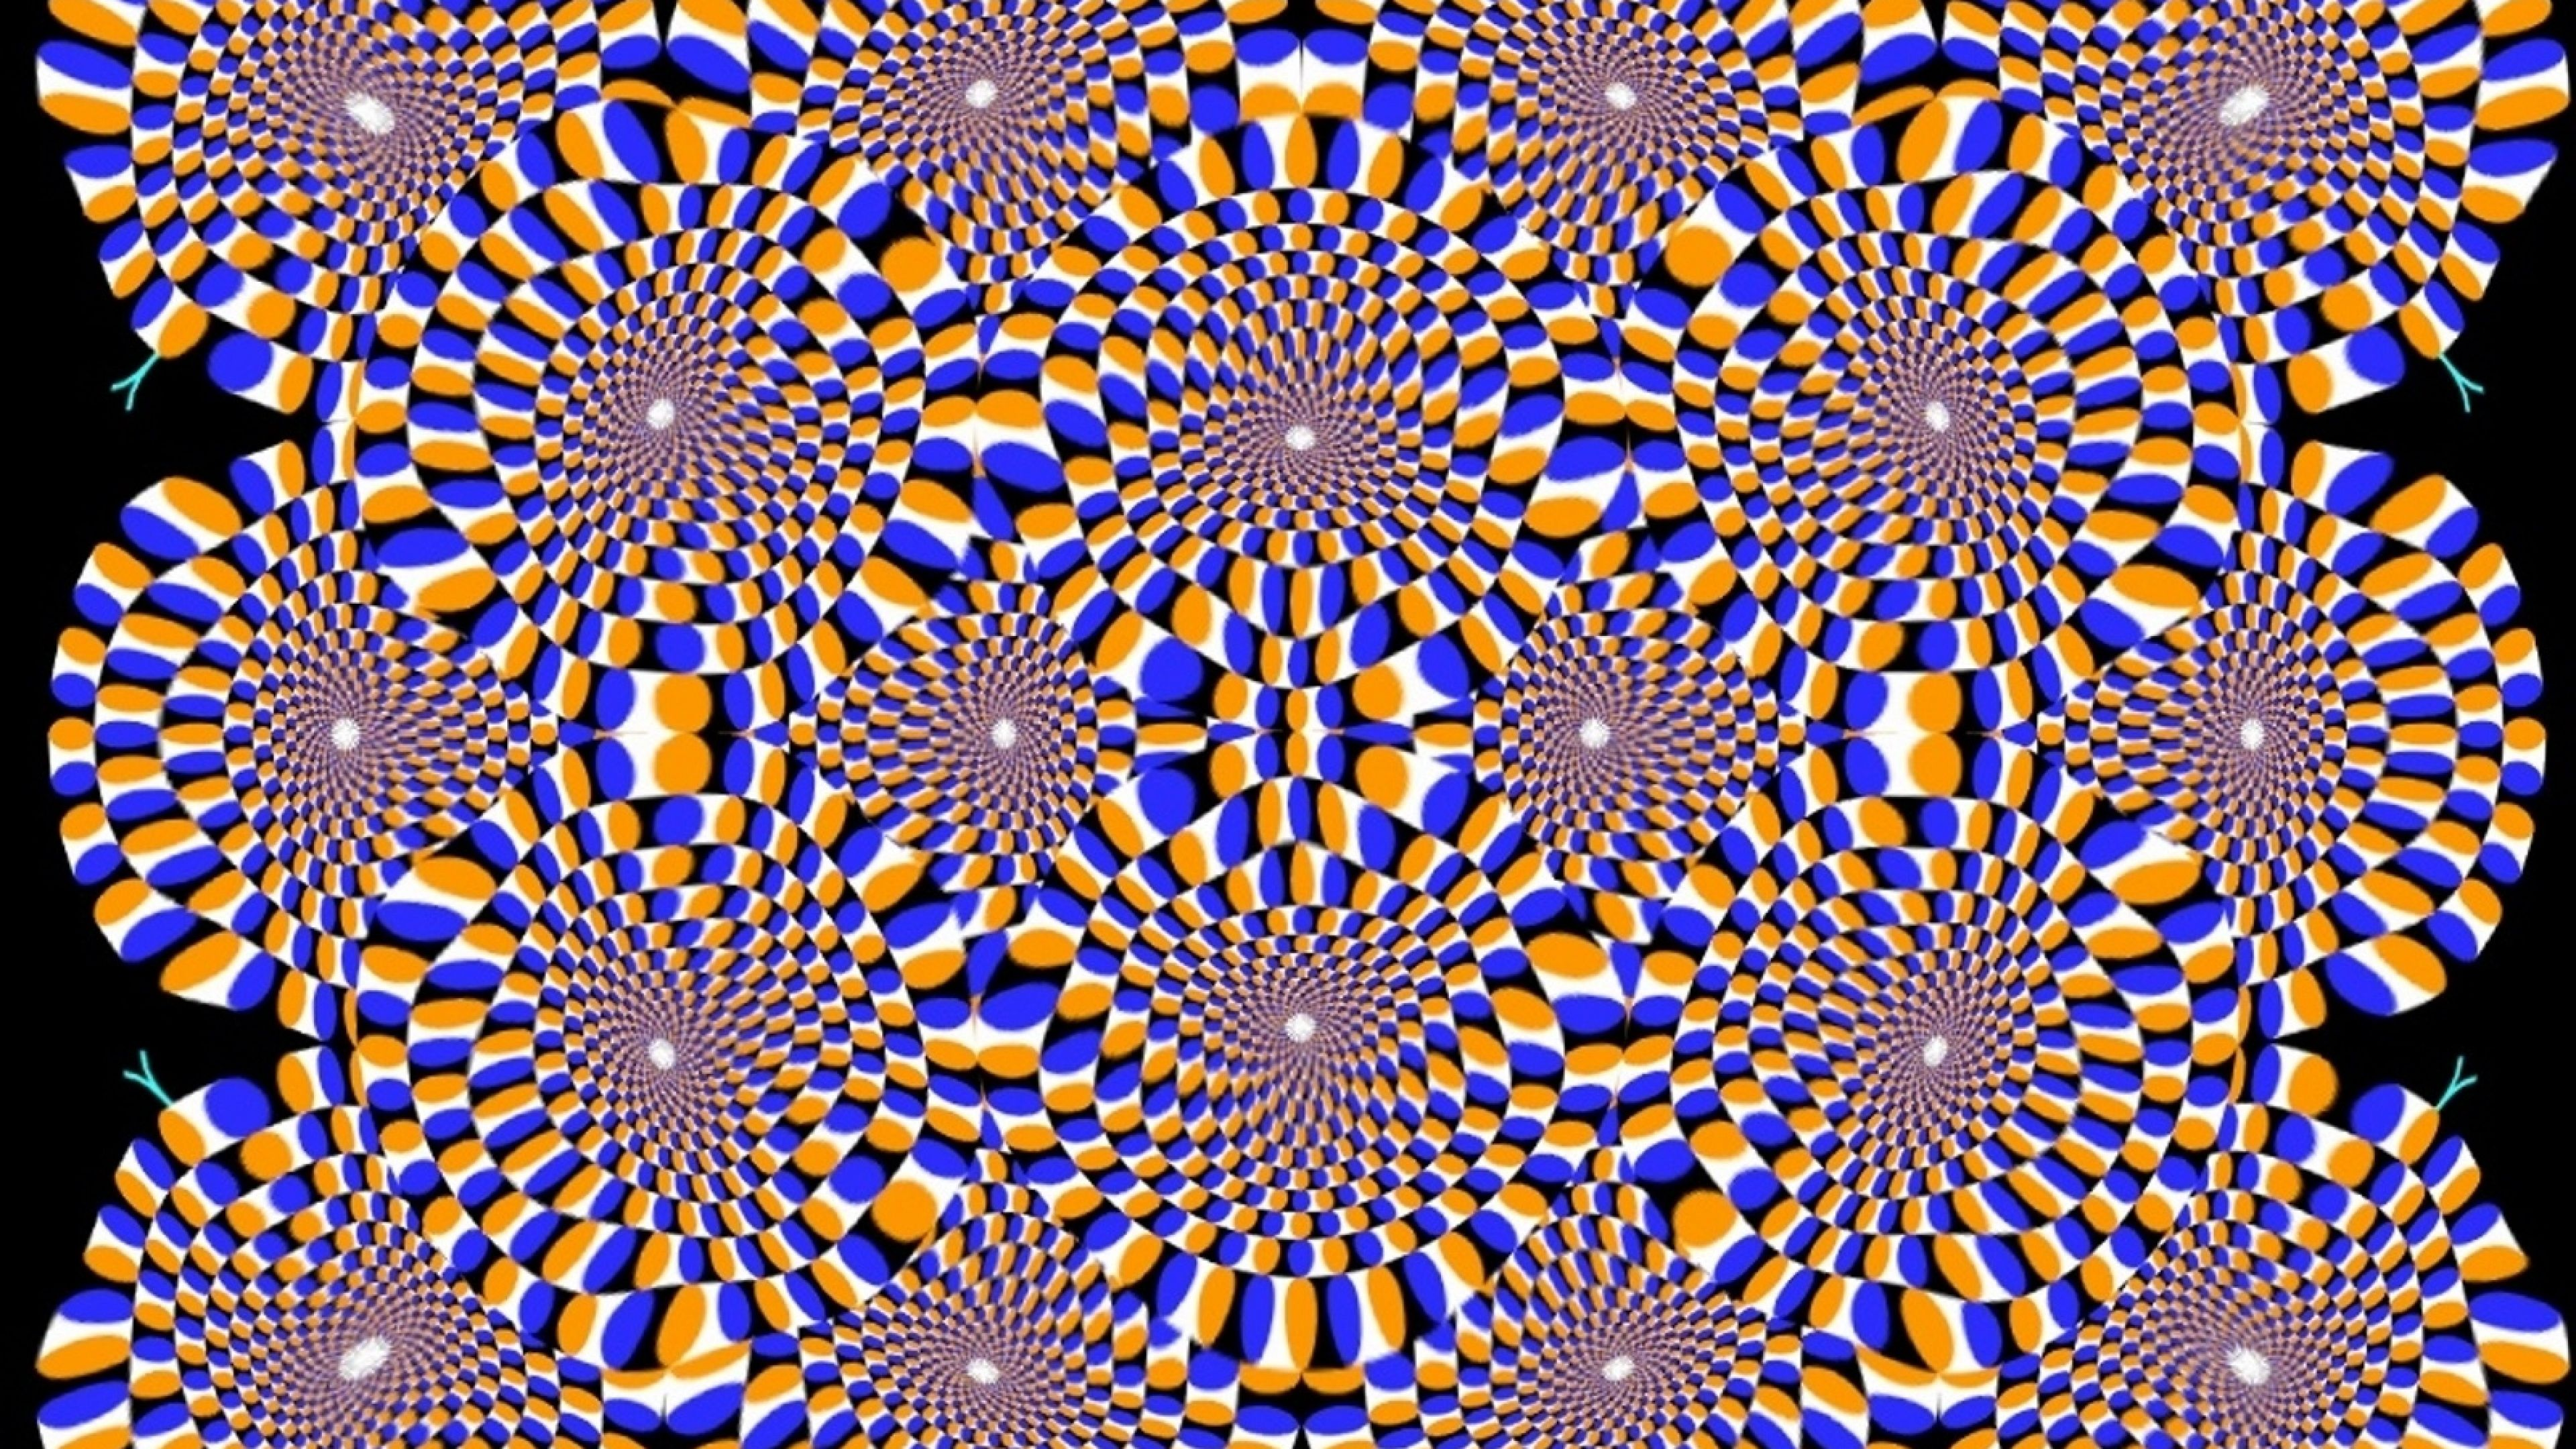 "3840x2160 Black And White Optical Illusion Wallpaper | Wallpaper Studio 10 ..."">"